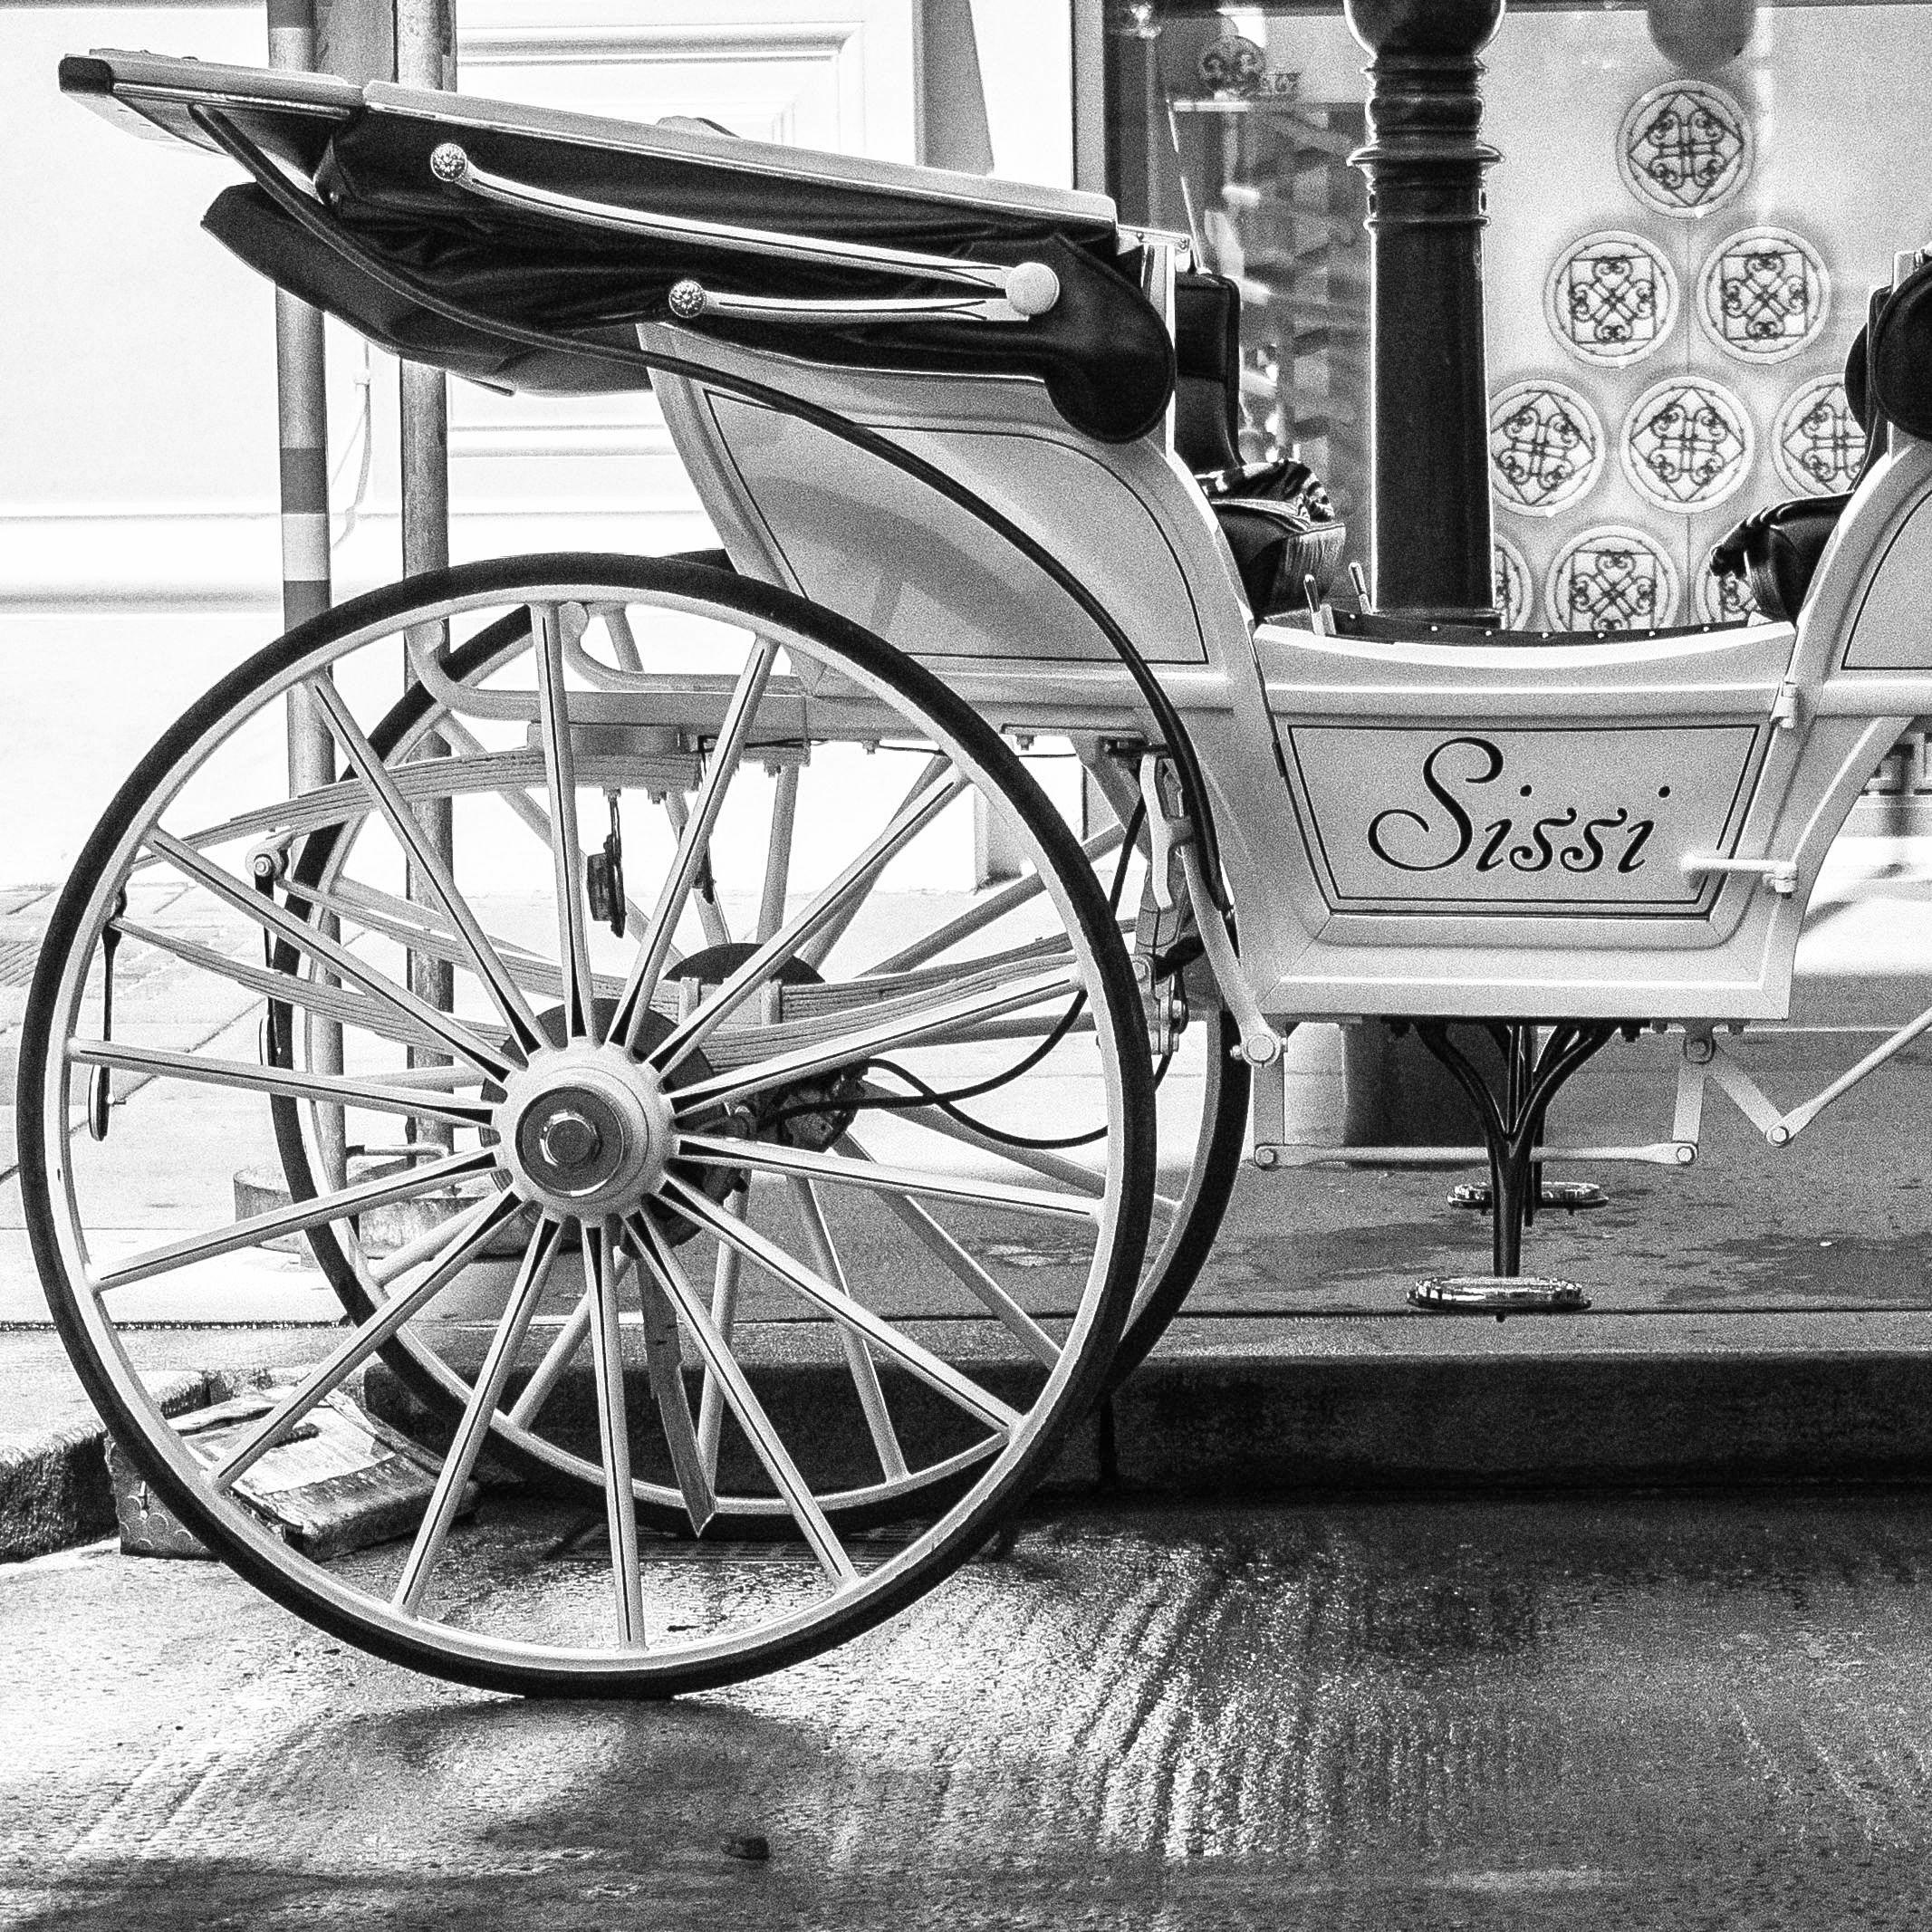 half-a-carriage